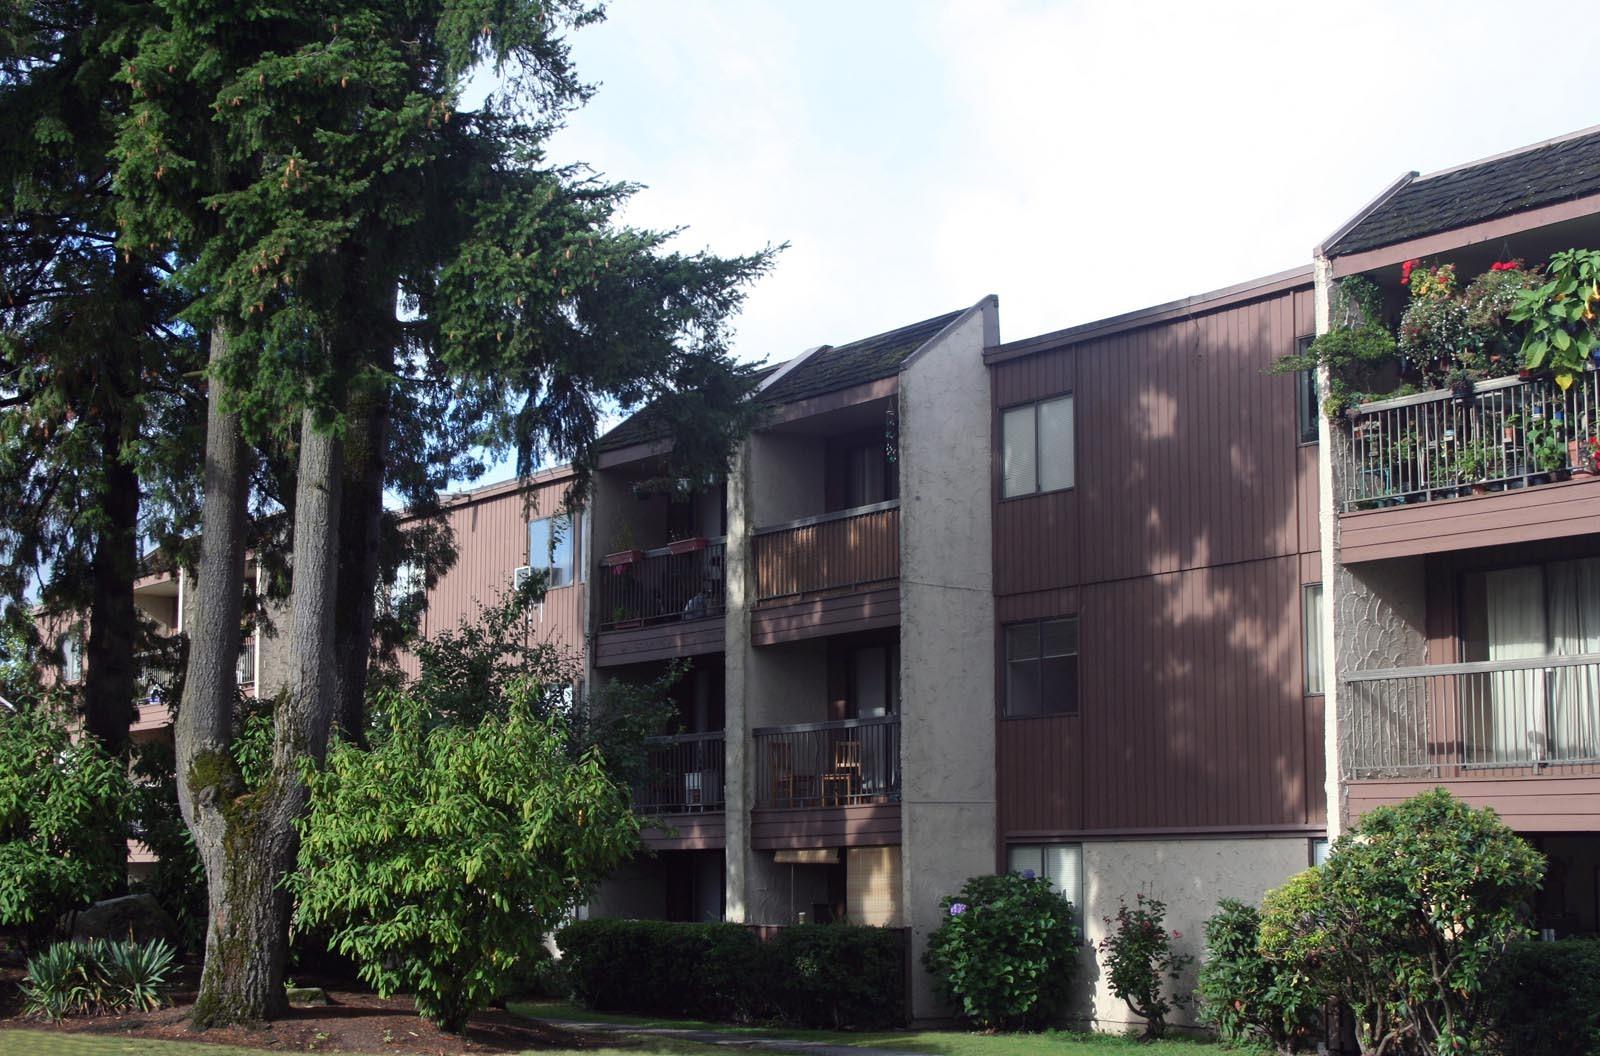 9555 128 Street, Surrey, BC - $1,450